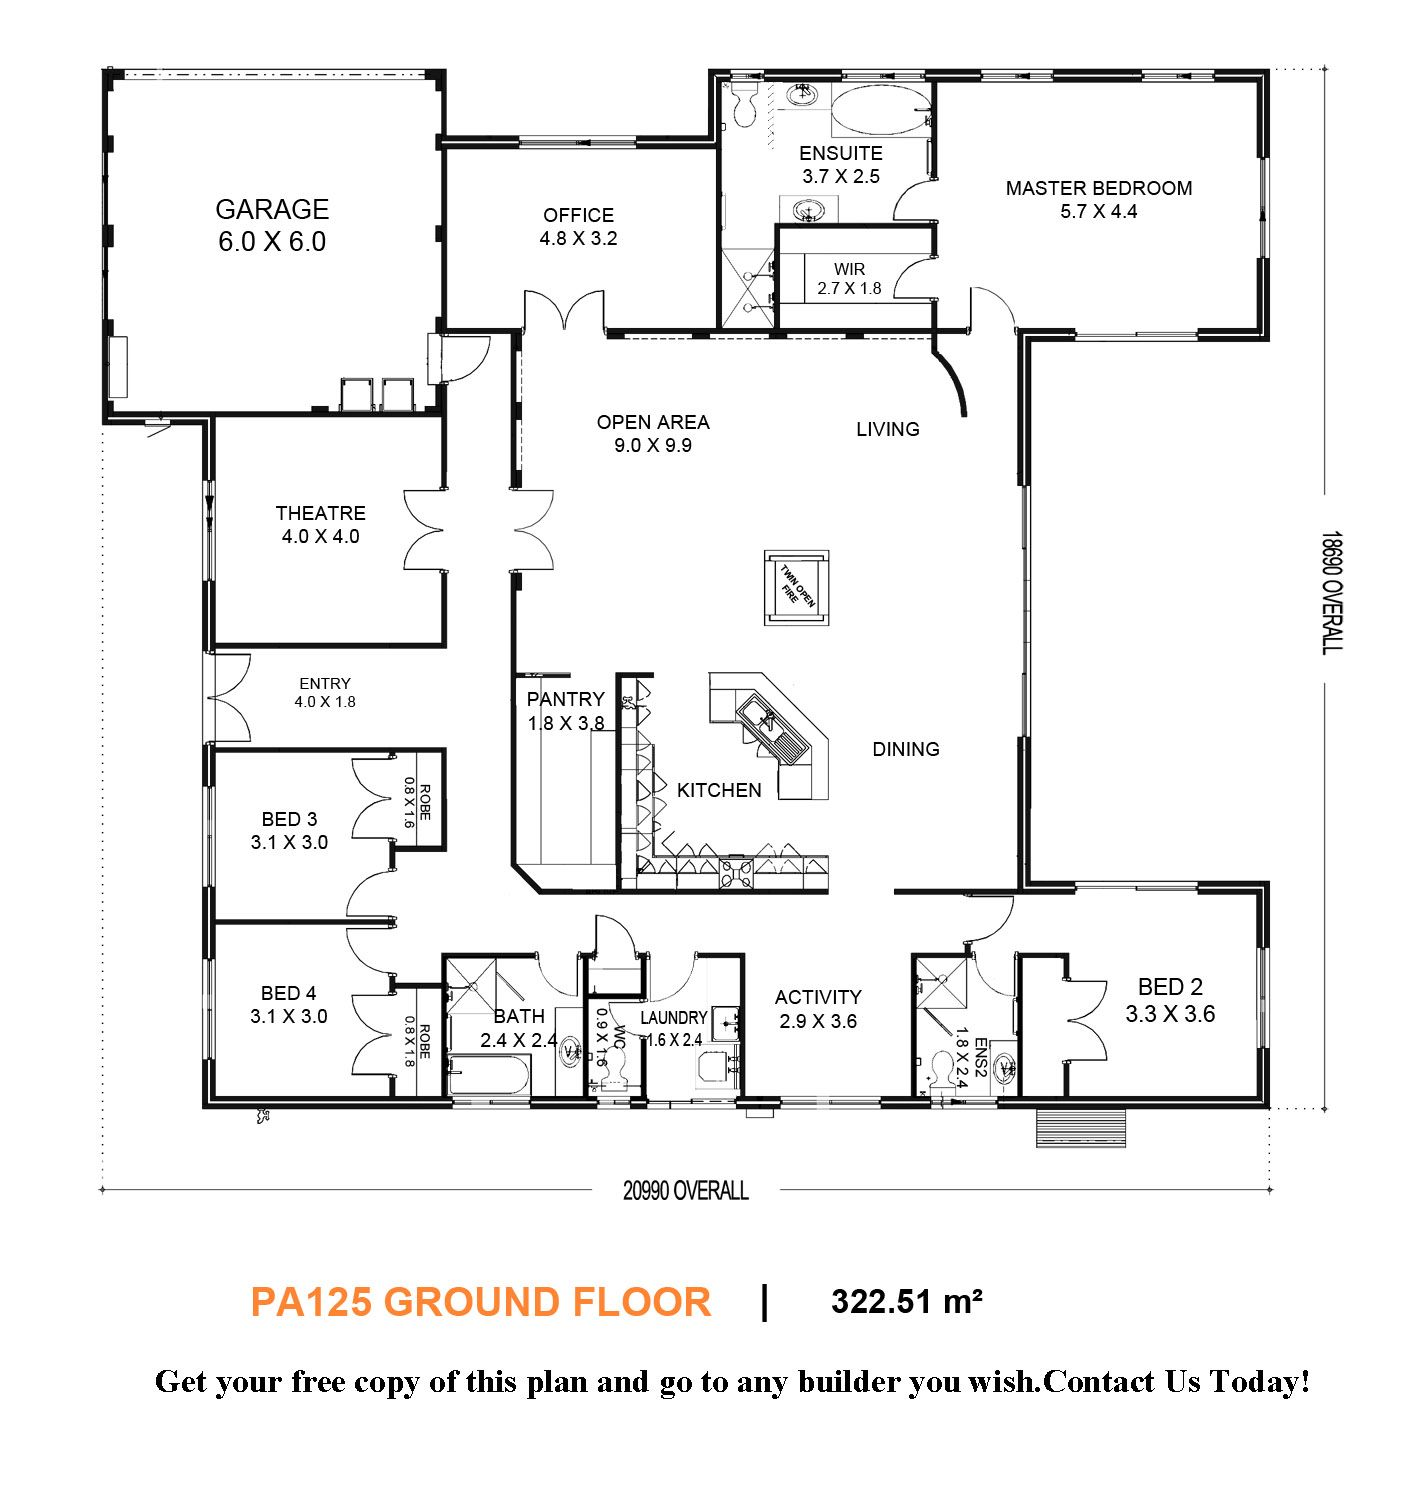 free house floor plans size 322 51m 2 width 18 69m